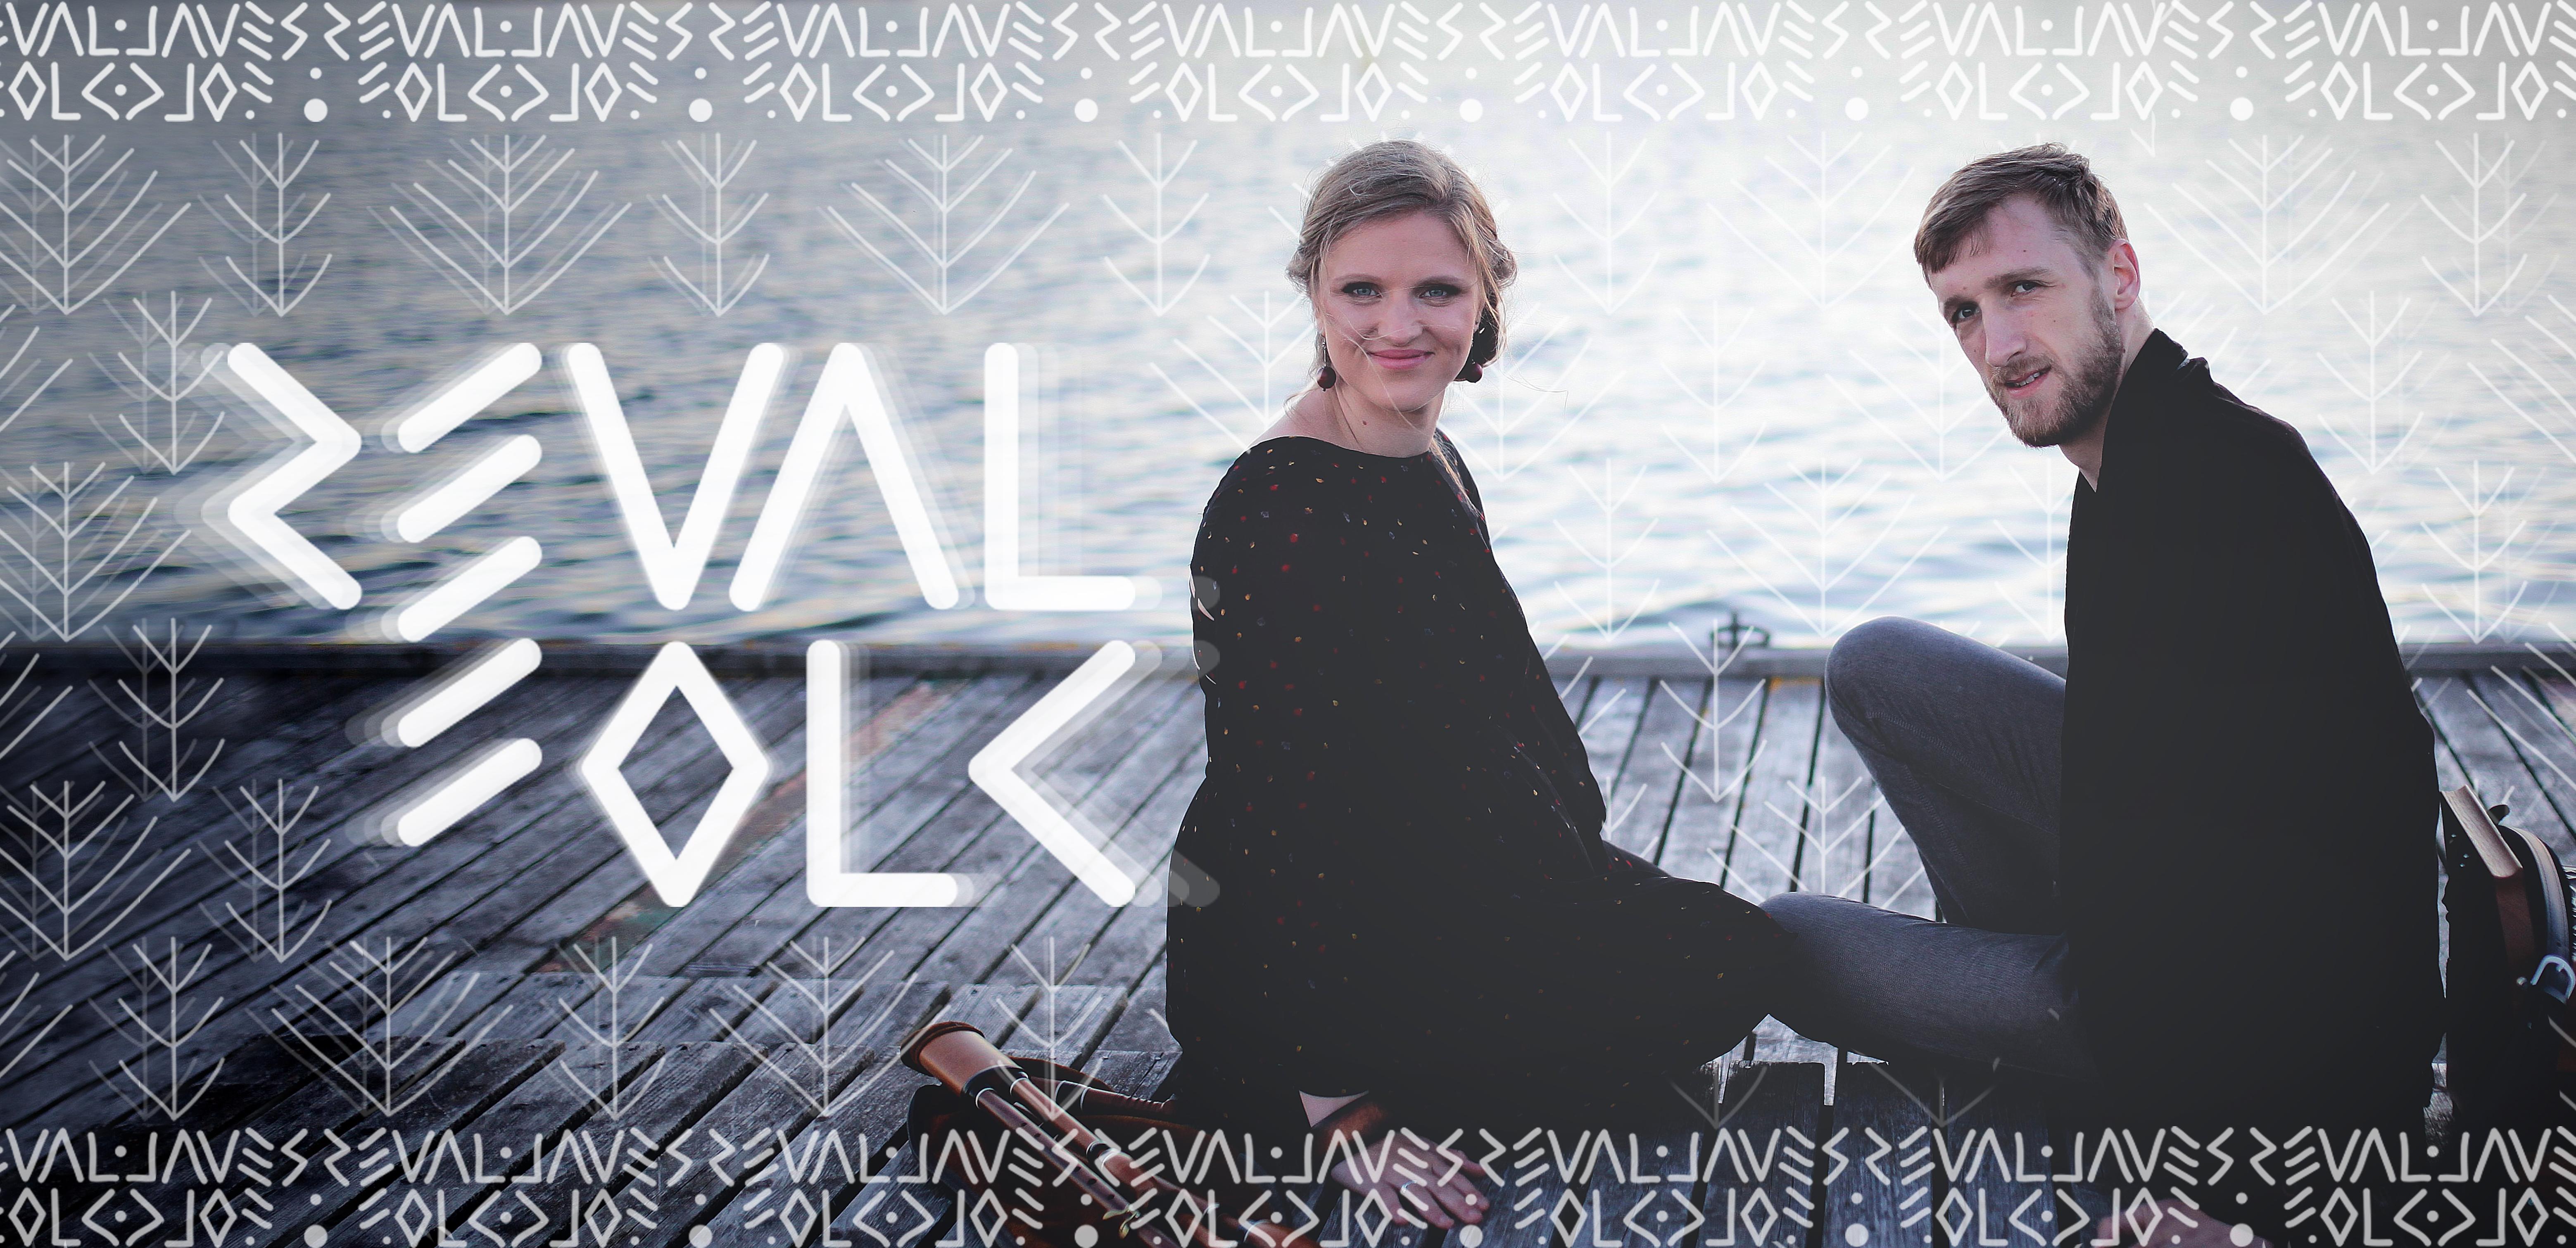 Leana ja Hartwin Eesti/Belgia 19. jaanuaril. 2018 kell 19:00 Vanalinna Muusikamajas (Uus 16c, Tallinn)